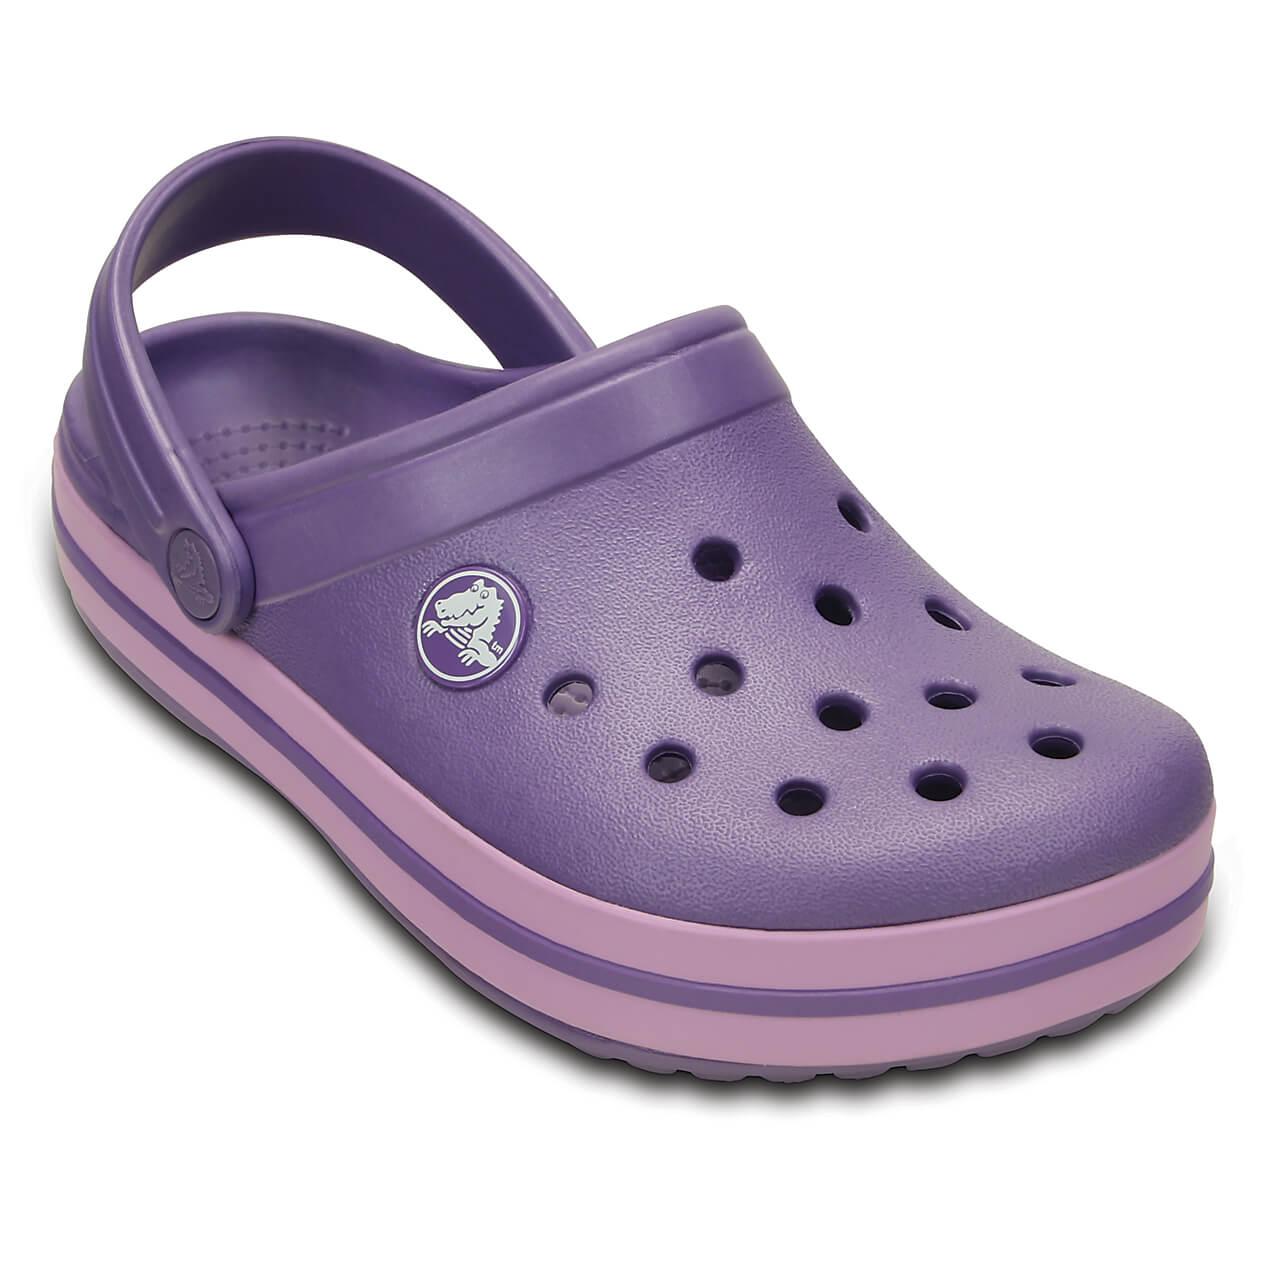 e1c277c71fd978 Crocs Crocband Kids